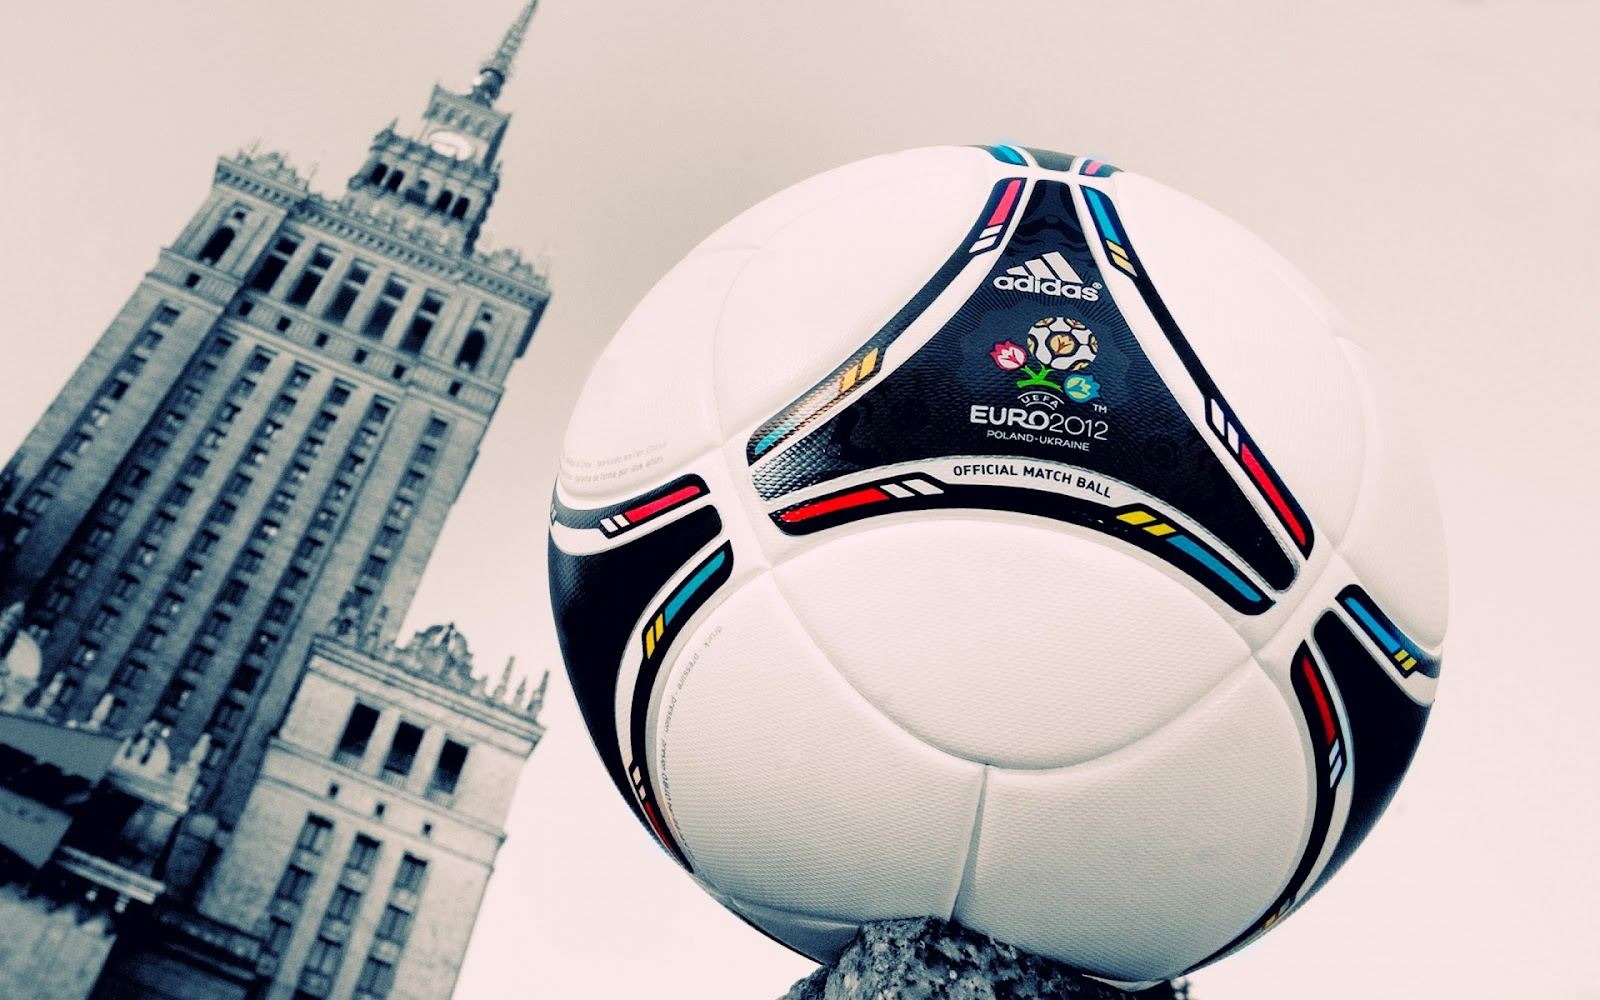 http://1.bp.blogspot.com/-dd9hgOtUMQw/UAEz9PudqdI/AAAAAAAAAt4/jXHVWGC82Io/s1600/UEFA+Euro+2012+Match+Ball+Wallpaper.jpg